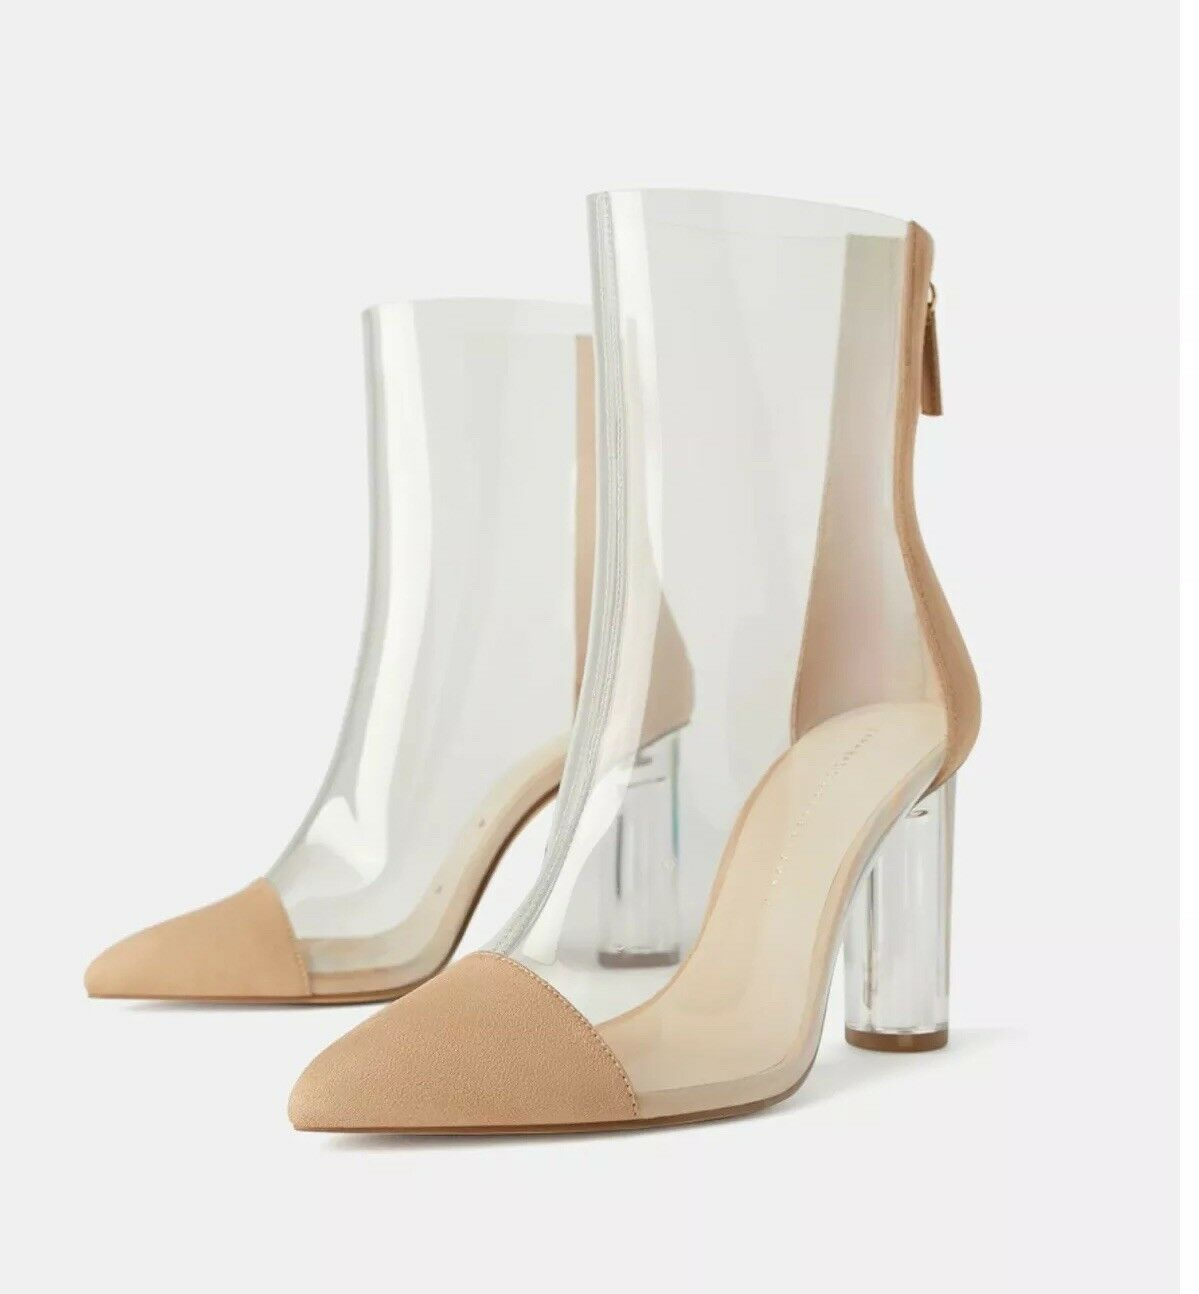 New Zara Natural Beige Heeled Transparent Vinyl Ankle Boots SZ 6.5